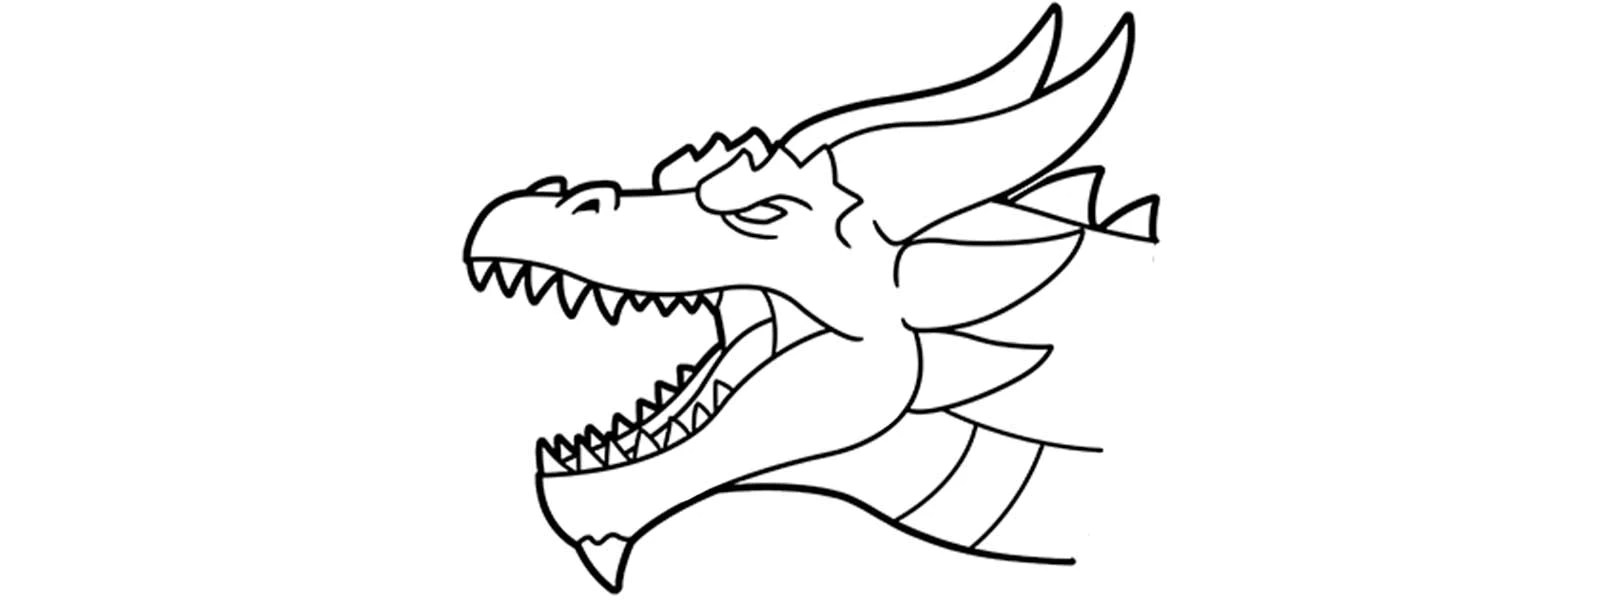 Comment Dessiner Une Tete De Dragon Dragon Naga